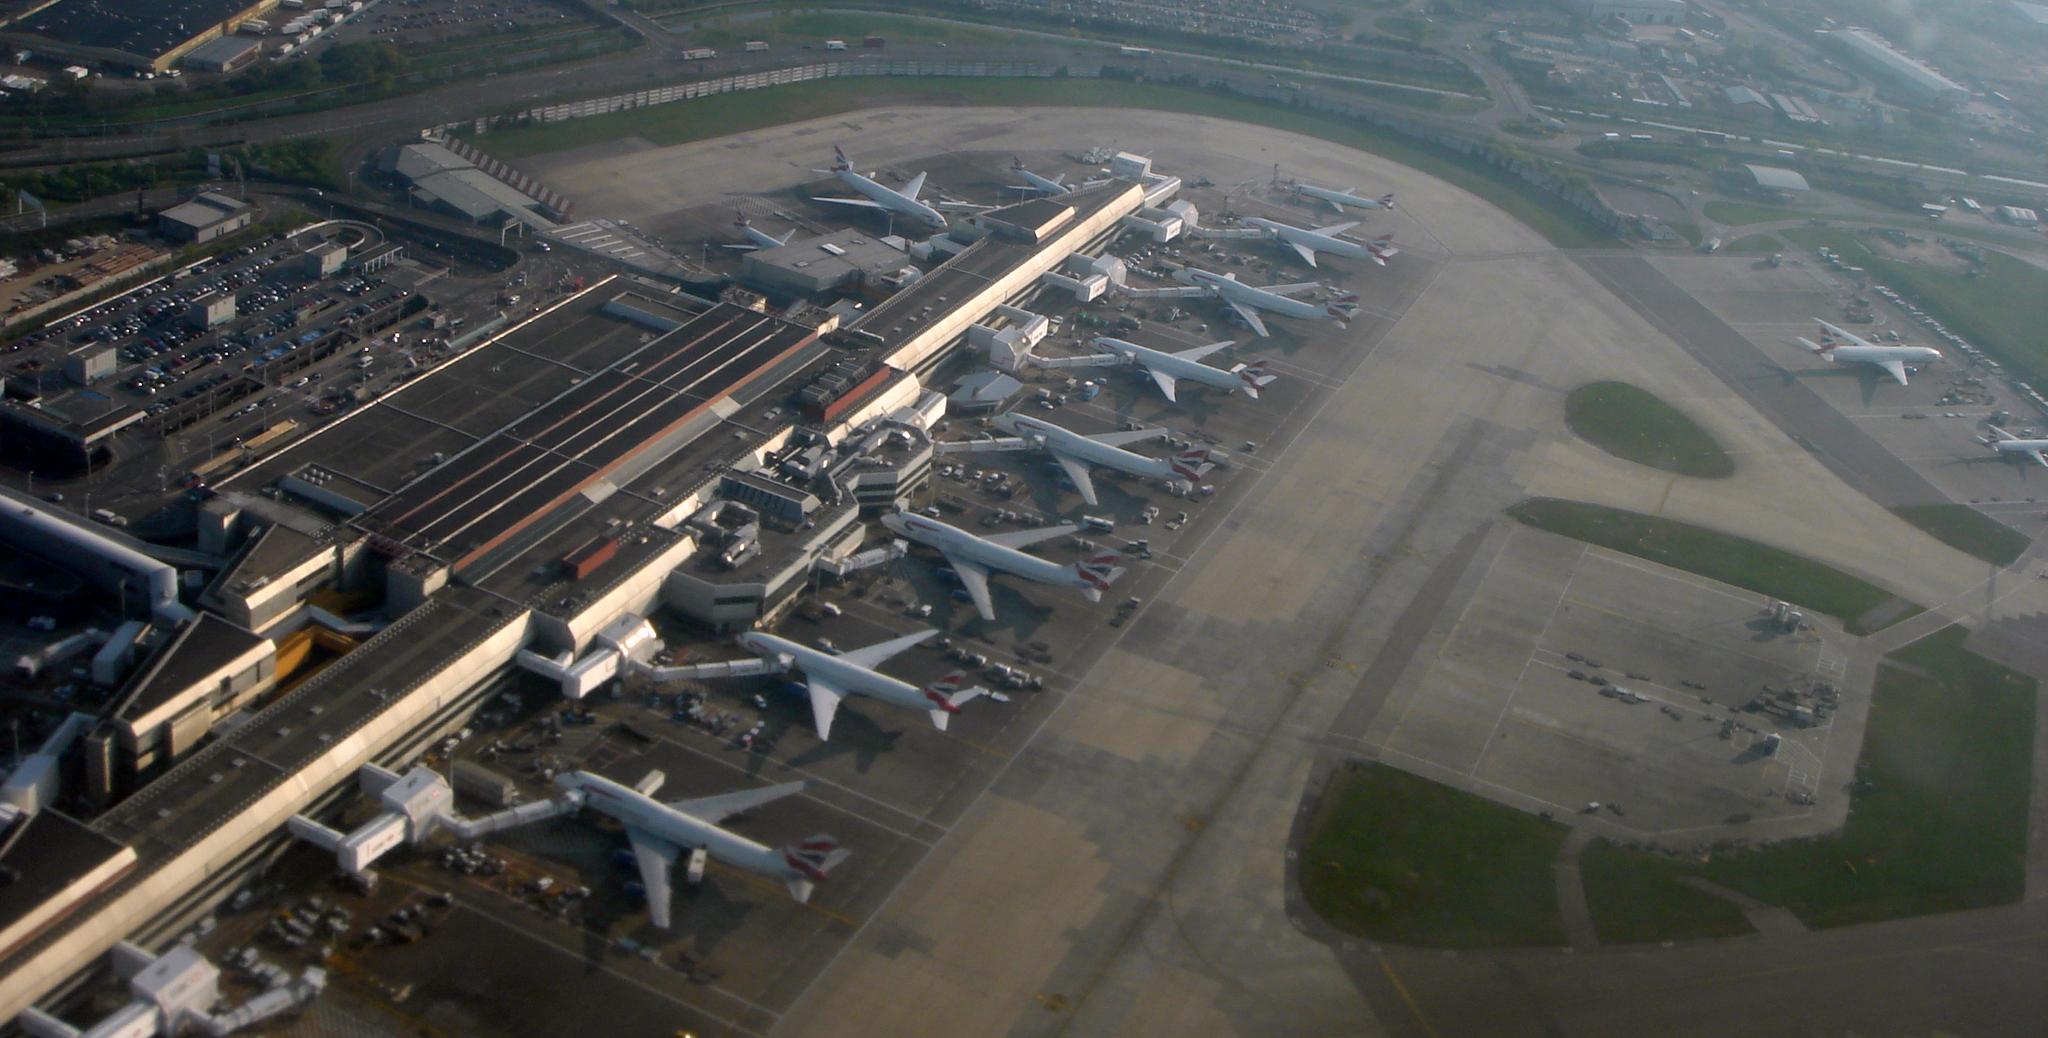 Flughafen London Heathrow - Wikiwand